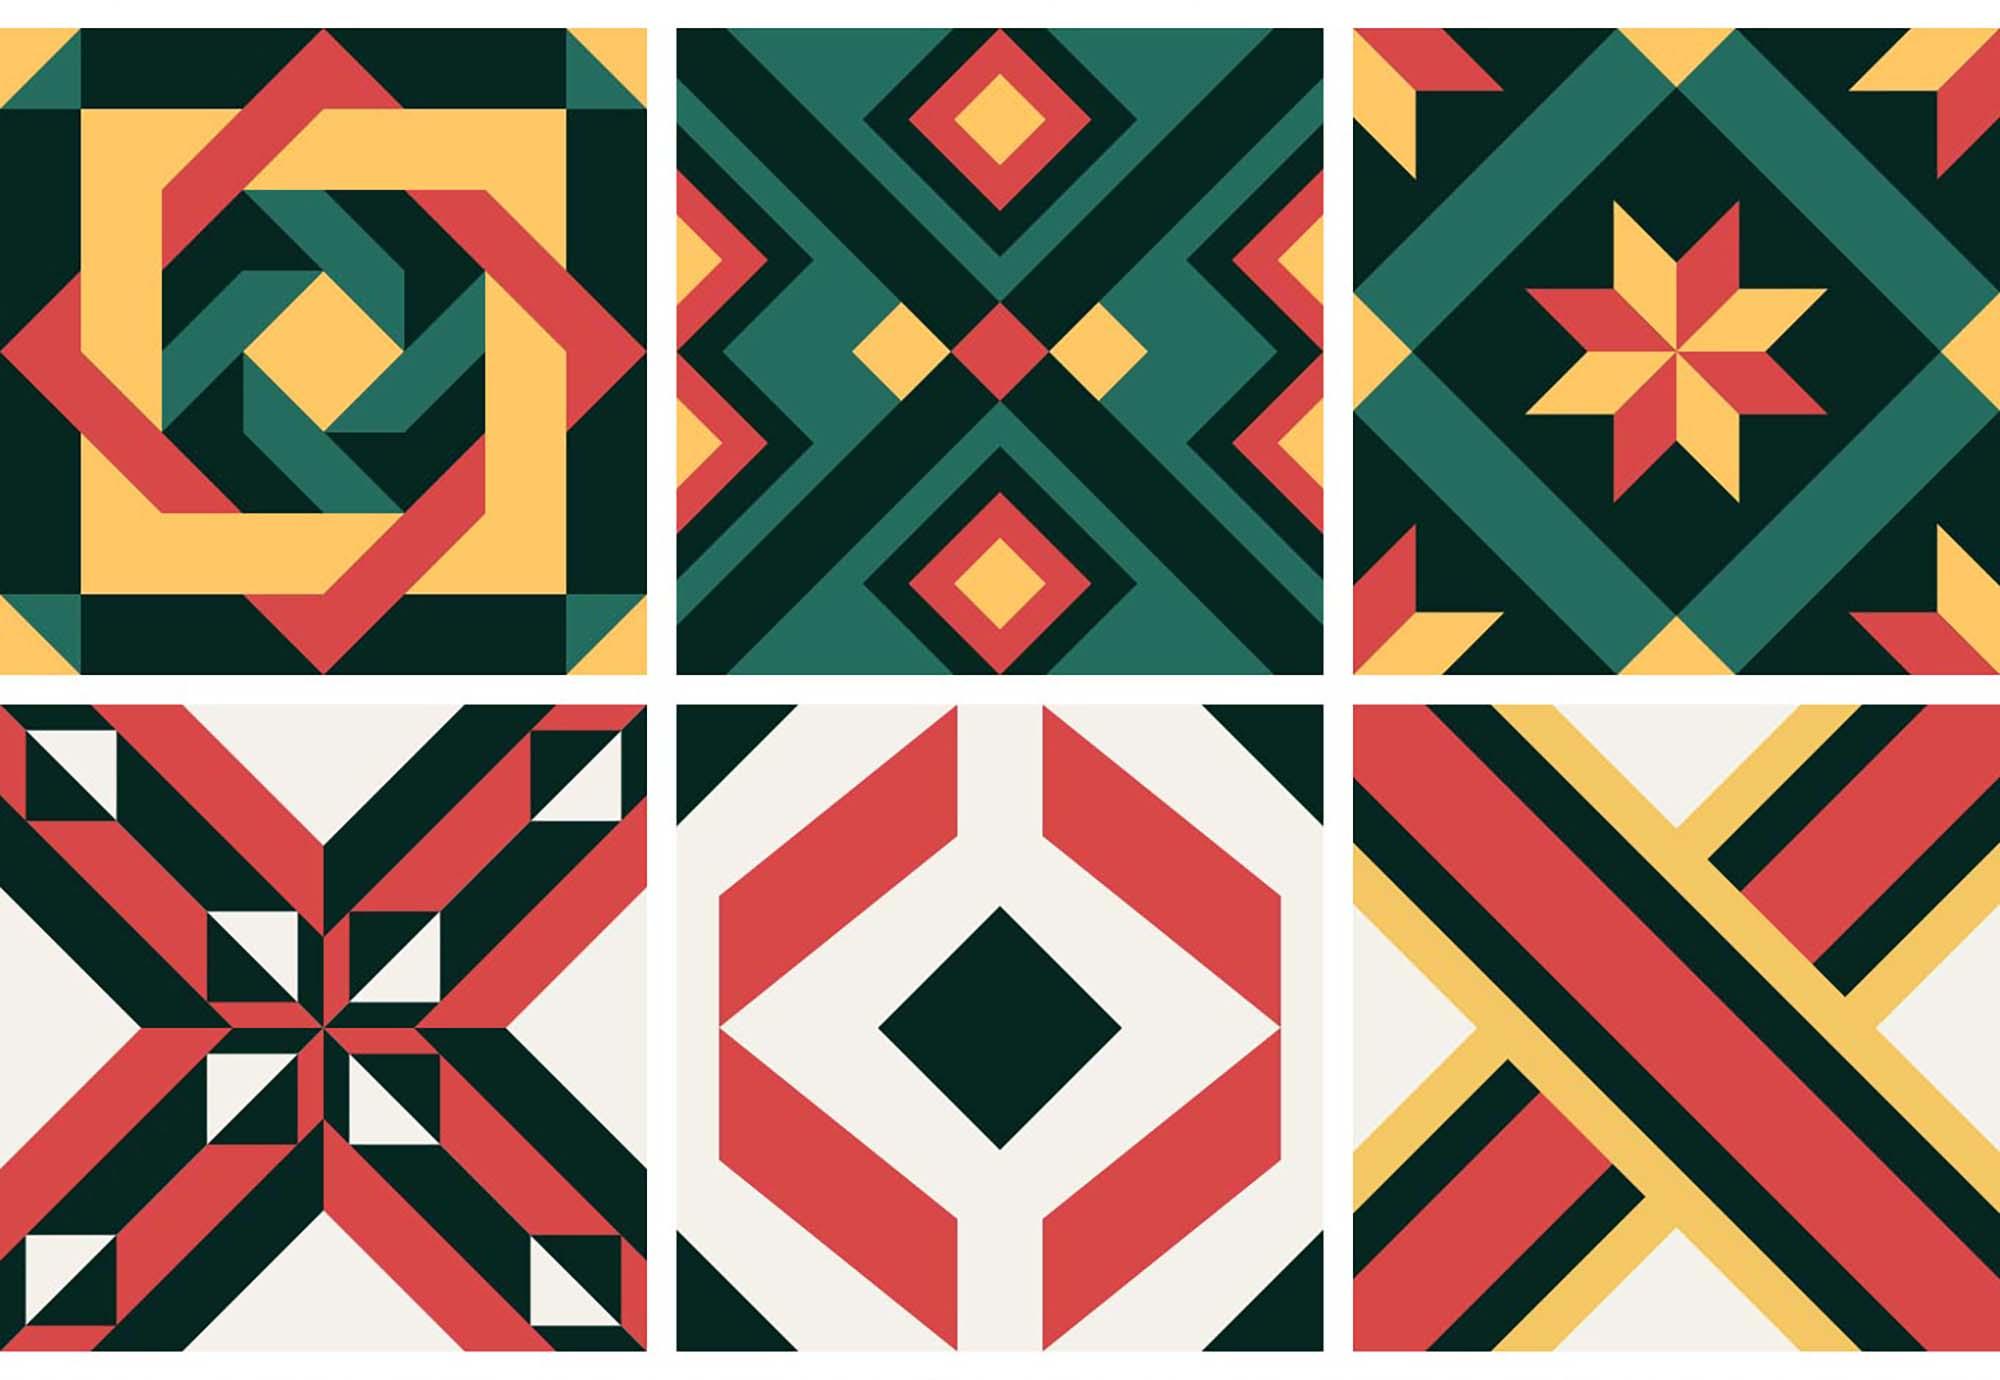 Portuguese Geometric Patterns 3